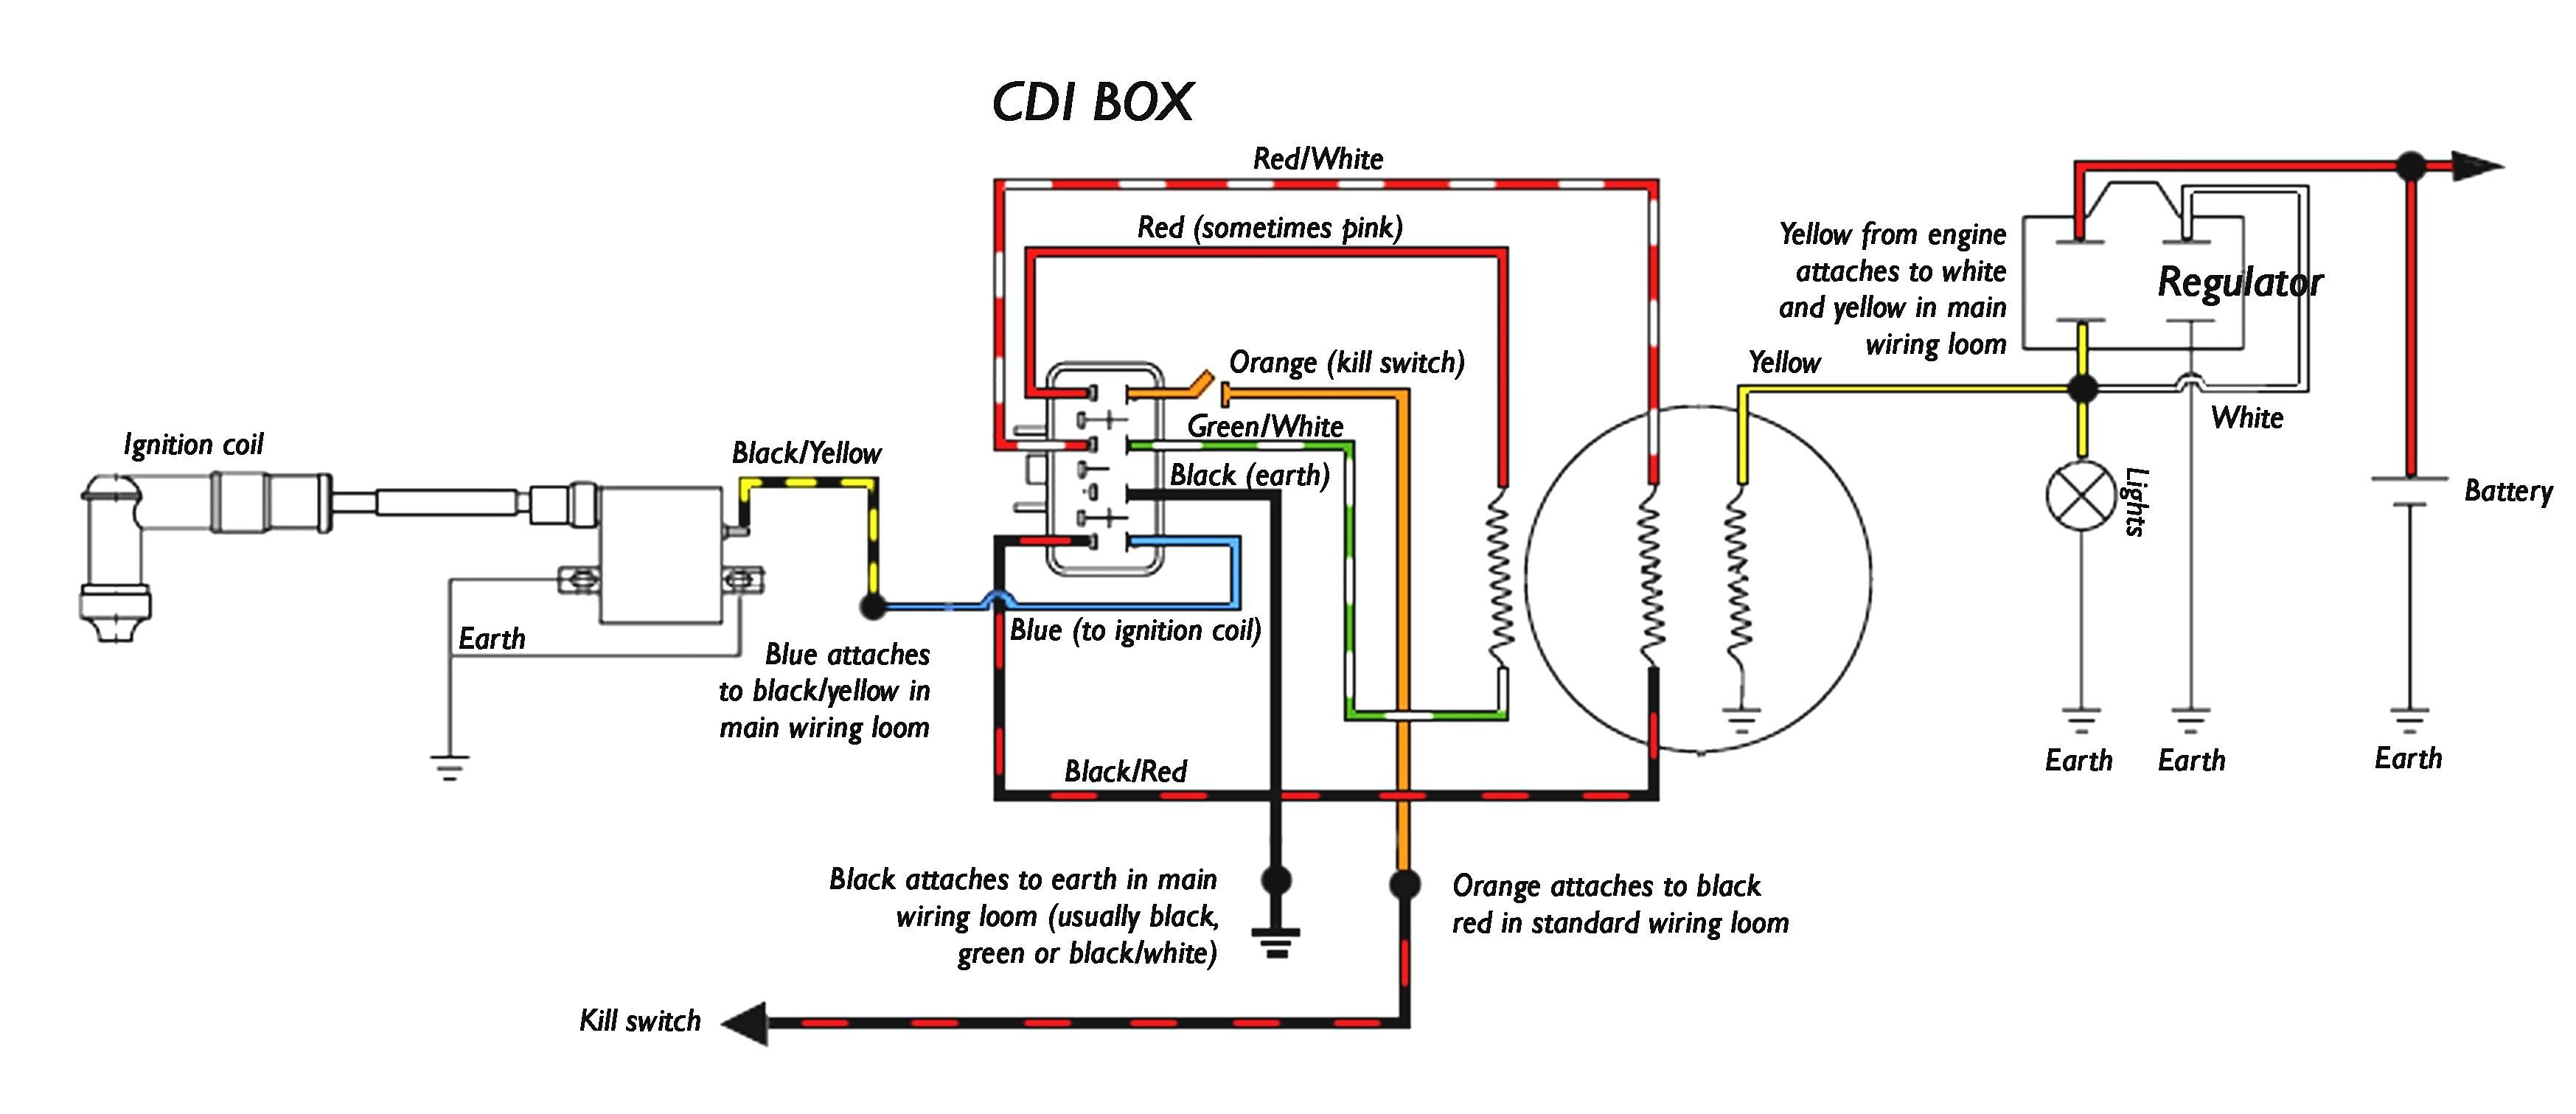 medium resolution of latest lifan 125cc wiring diagram 110 dirt bike diagrams brilliant with regard to lifan 125 wiring